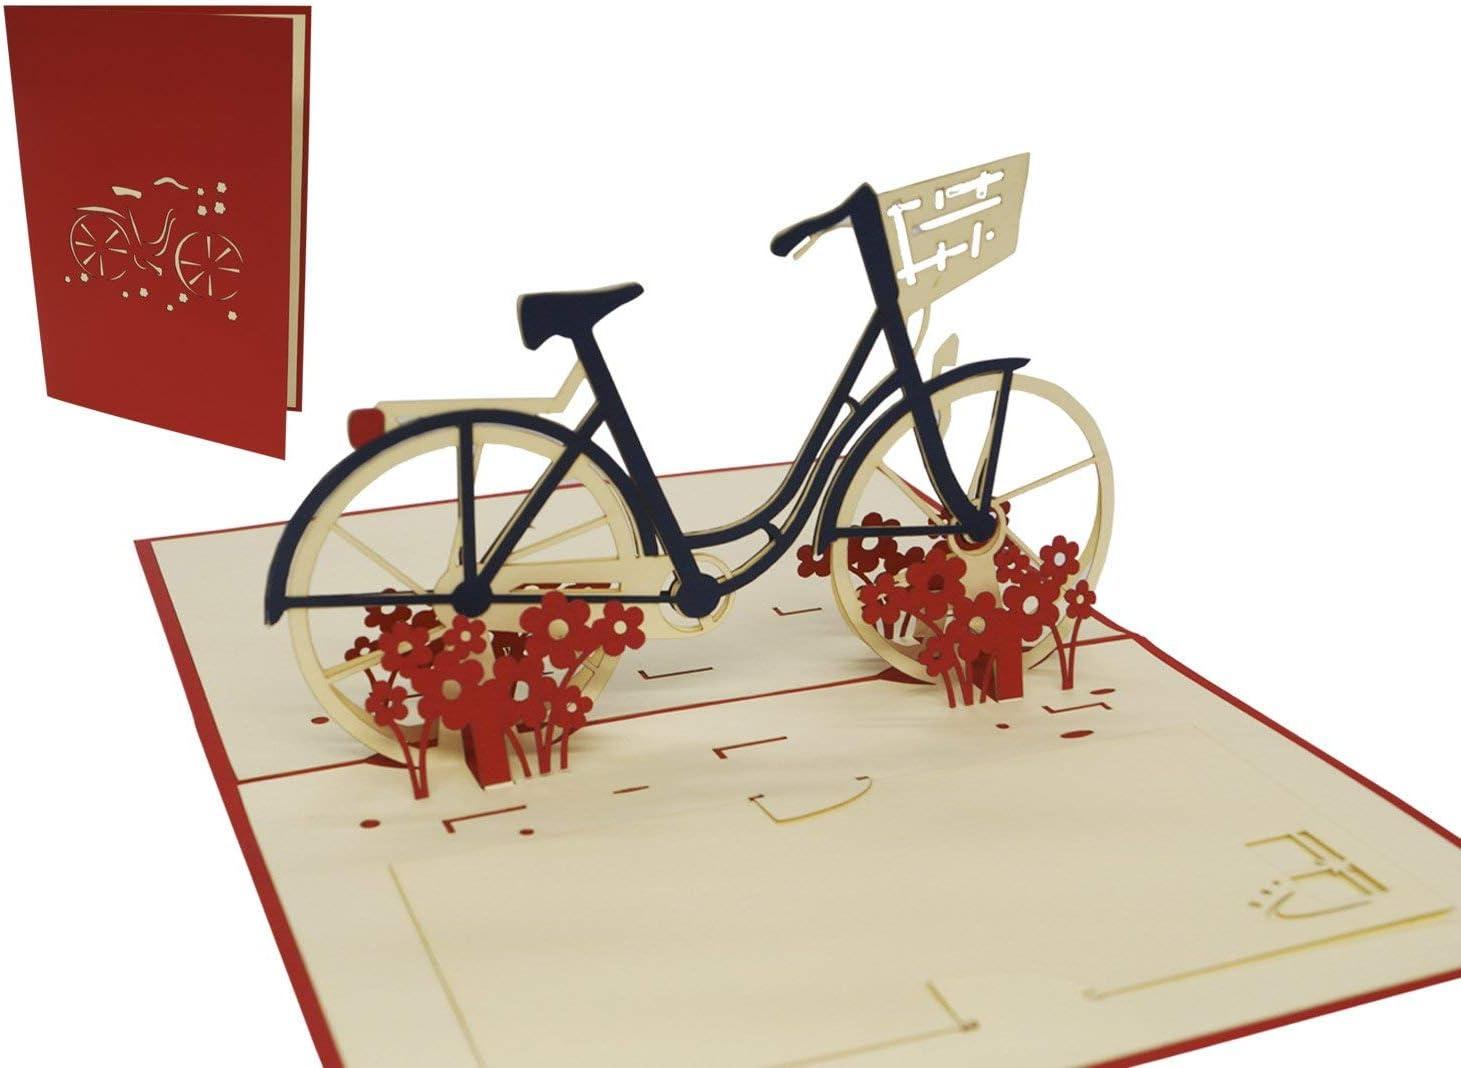 LIN-POP UP 3D Gru/ßkarten Fahrrad Gl/ückwunschskarten Gutscheinskarten Geburtstagskarten Venlo Damenfahrrad